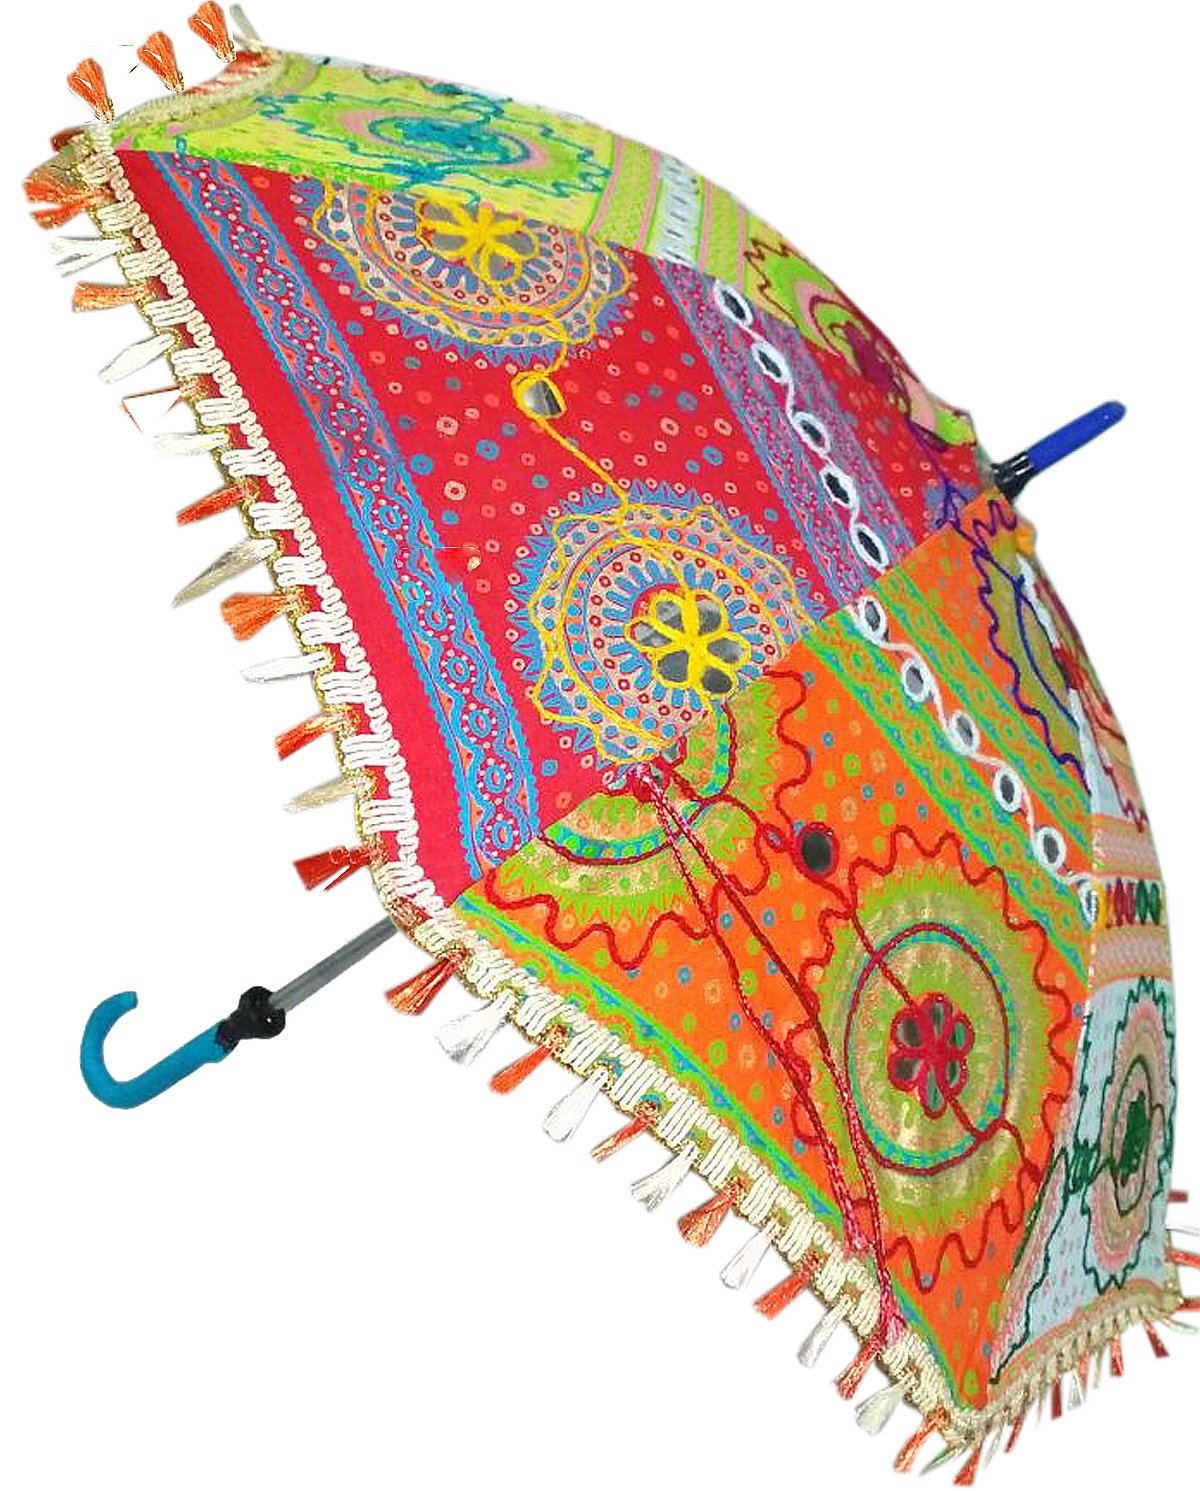 684c694b964c8 Handmade Rajasthani Umbrella: Amazon.in: Bags, Wallets & Luggage